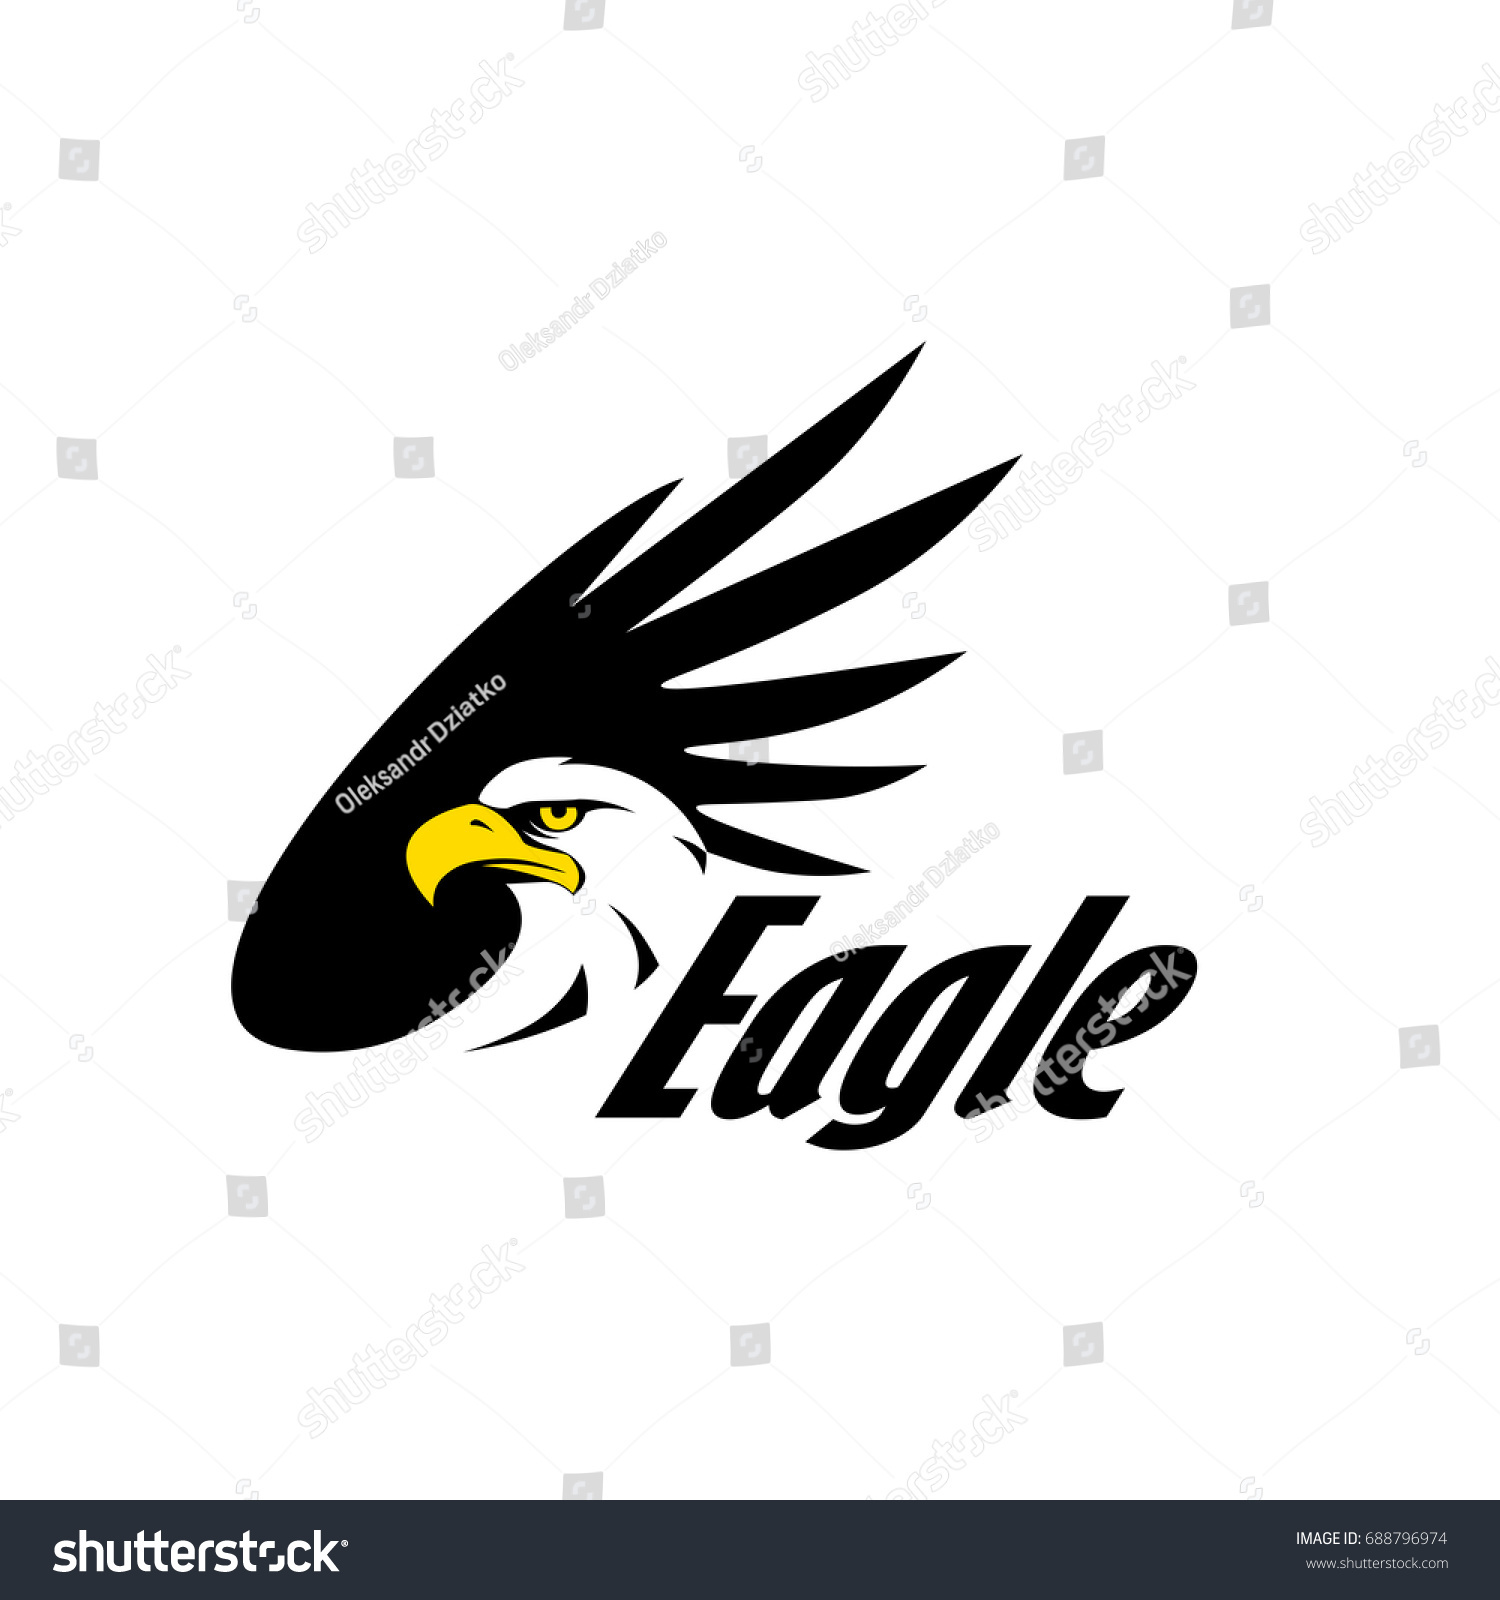 Symbol eagle hawk predator sport team stock vector 688796974 symbol of eagle hawk predator for sport team mascot company badge guard service biocorpaavc Images